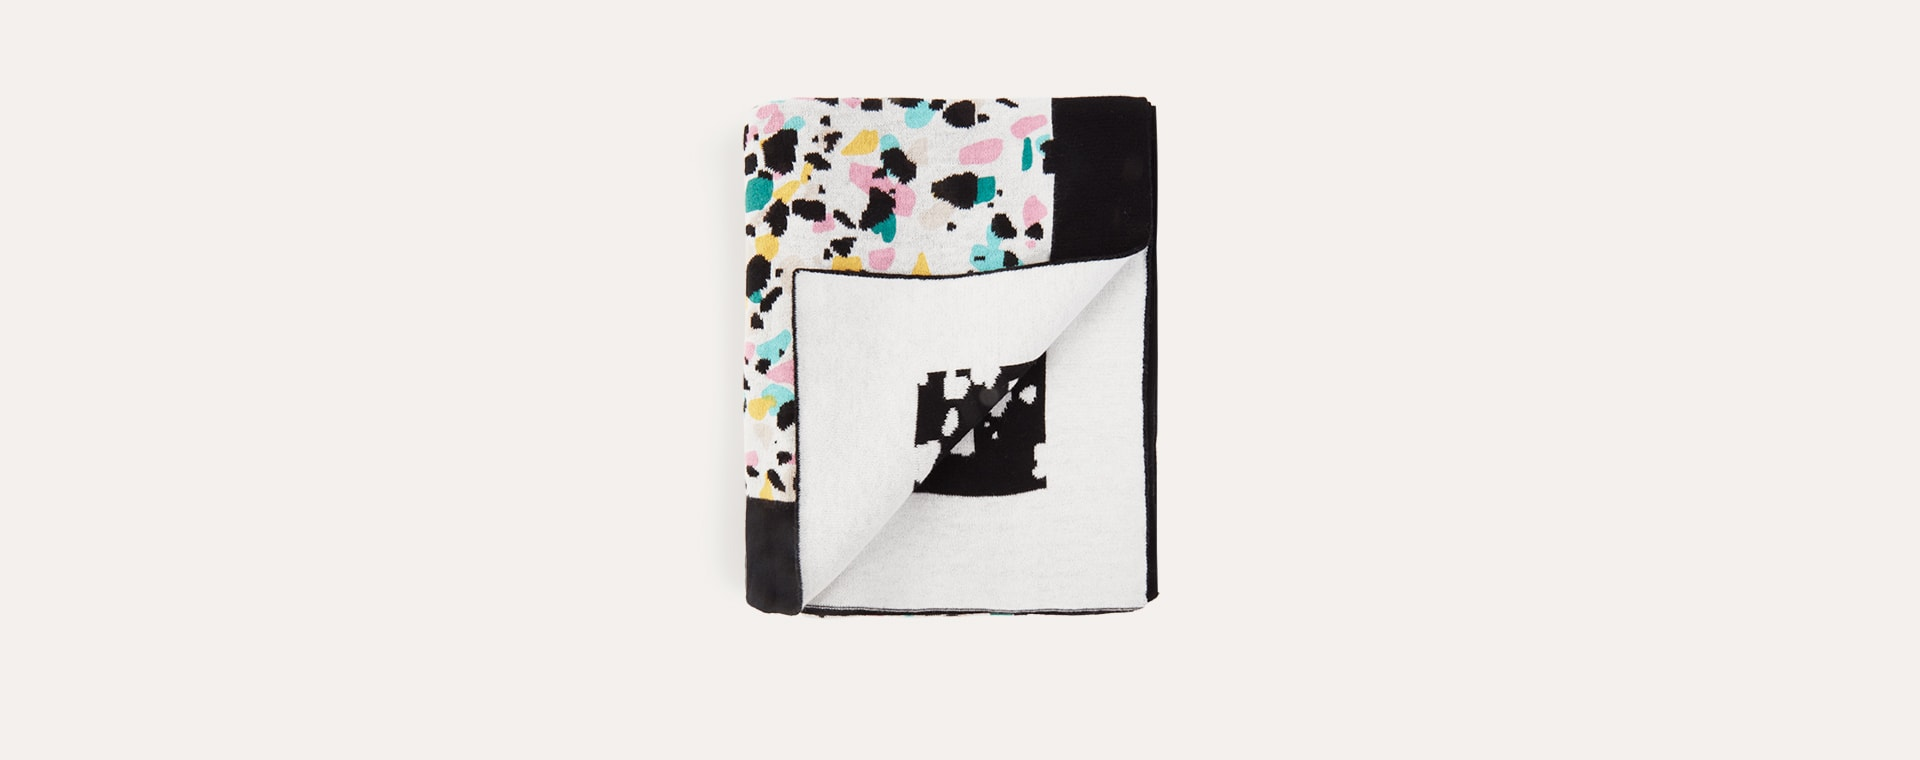 Terrazzo Etta Loves Knitted Blanket